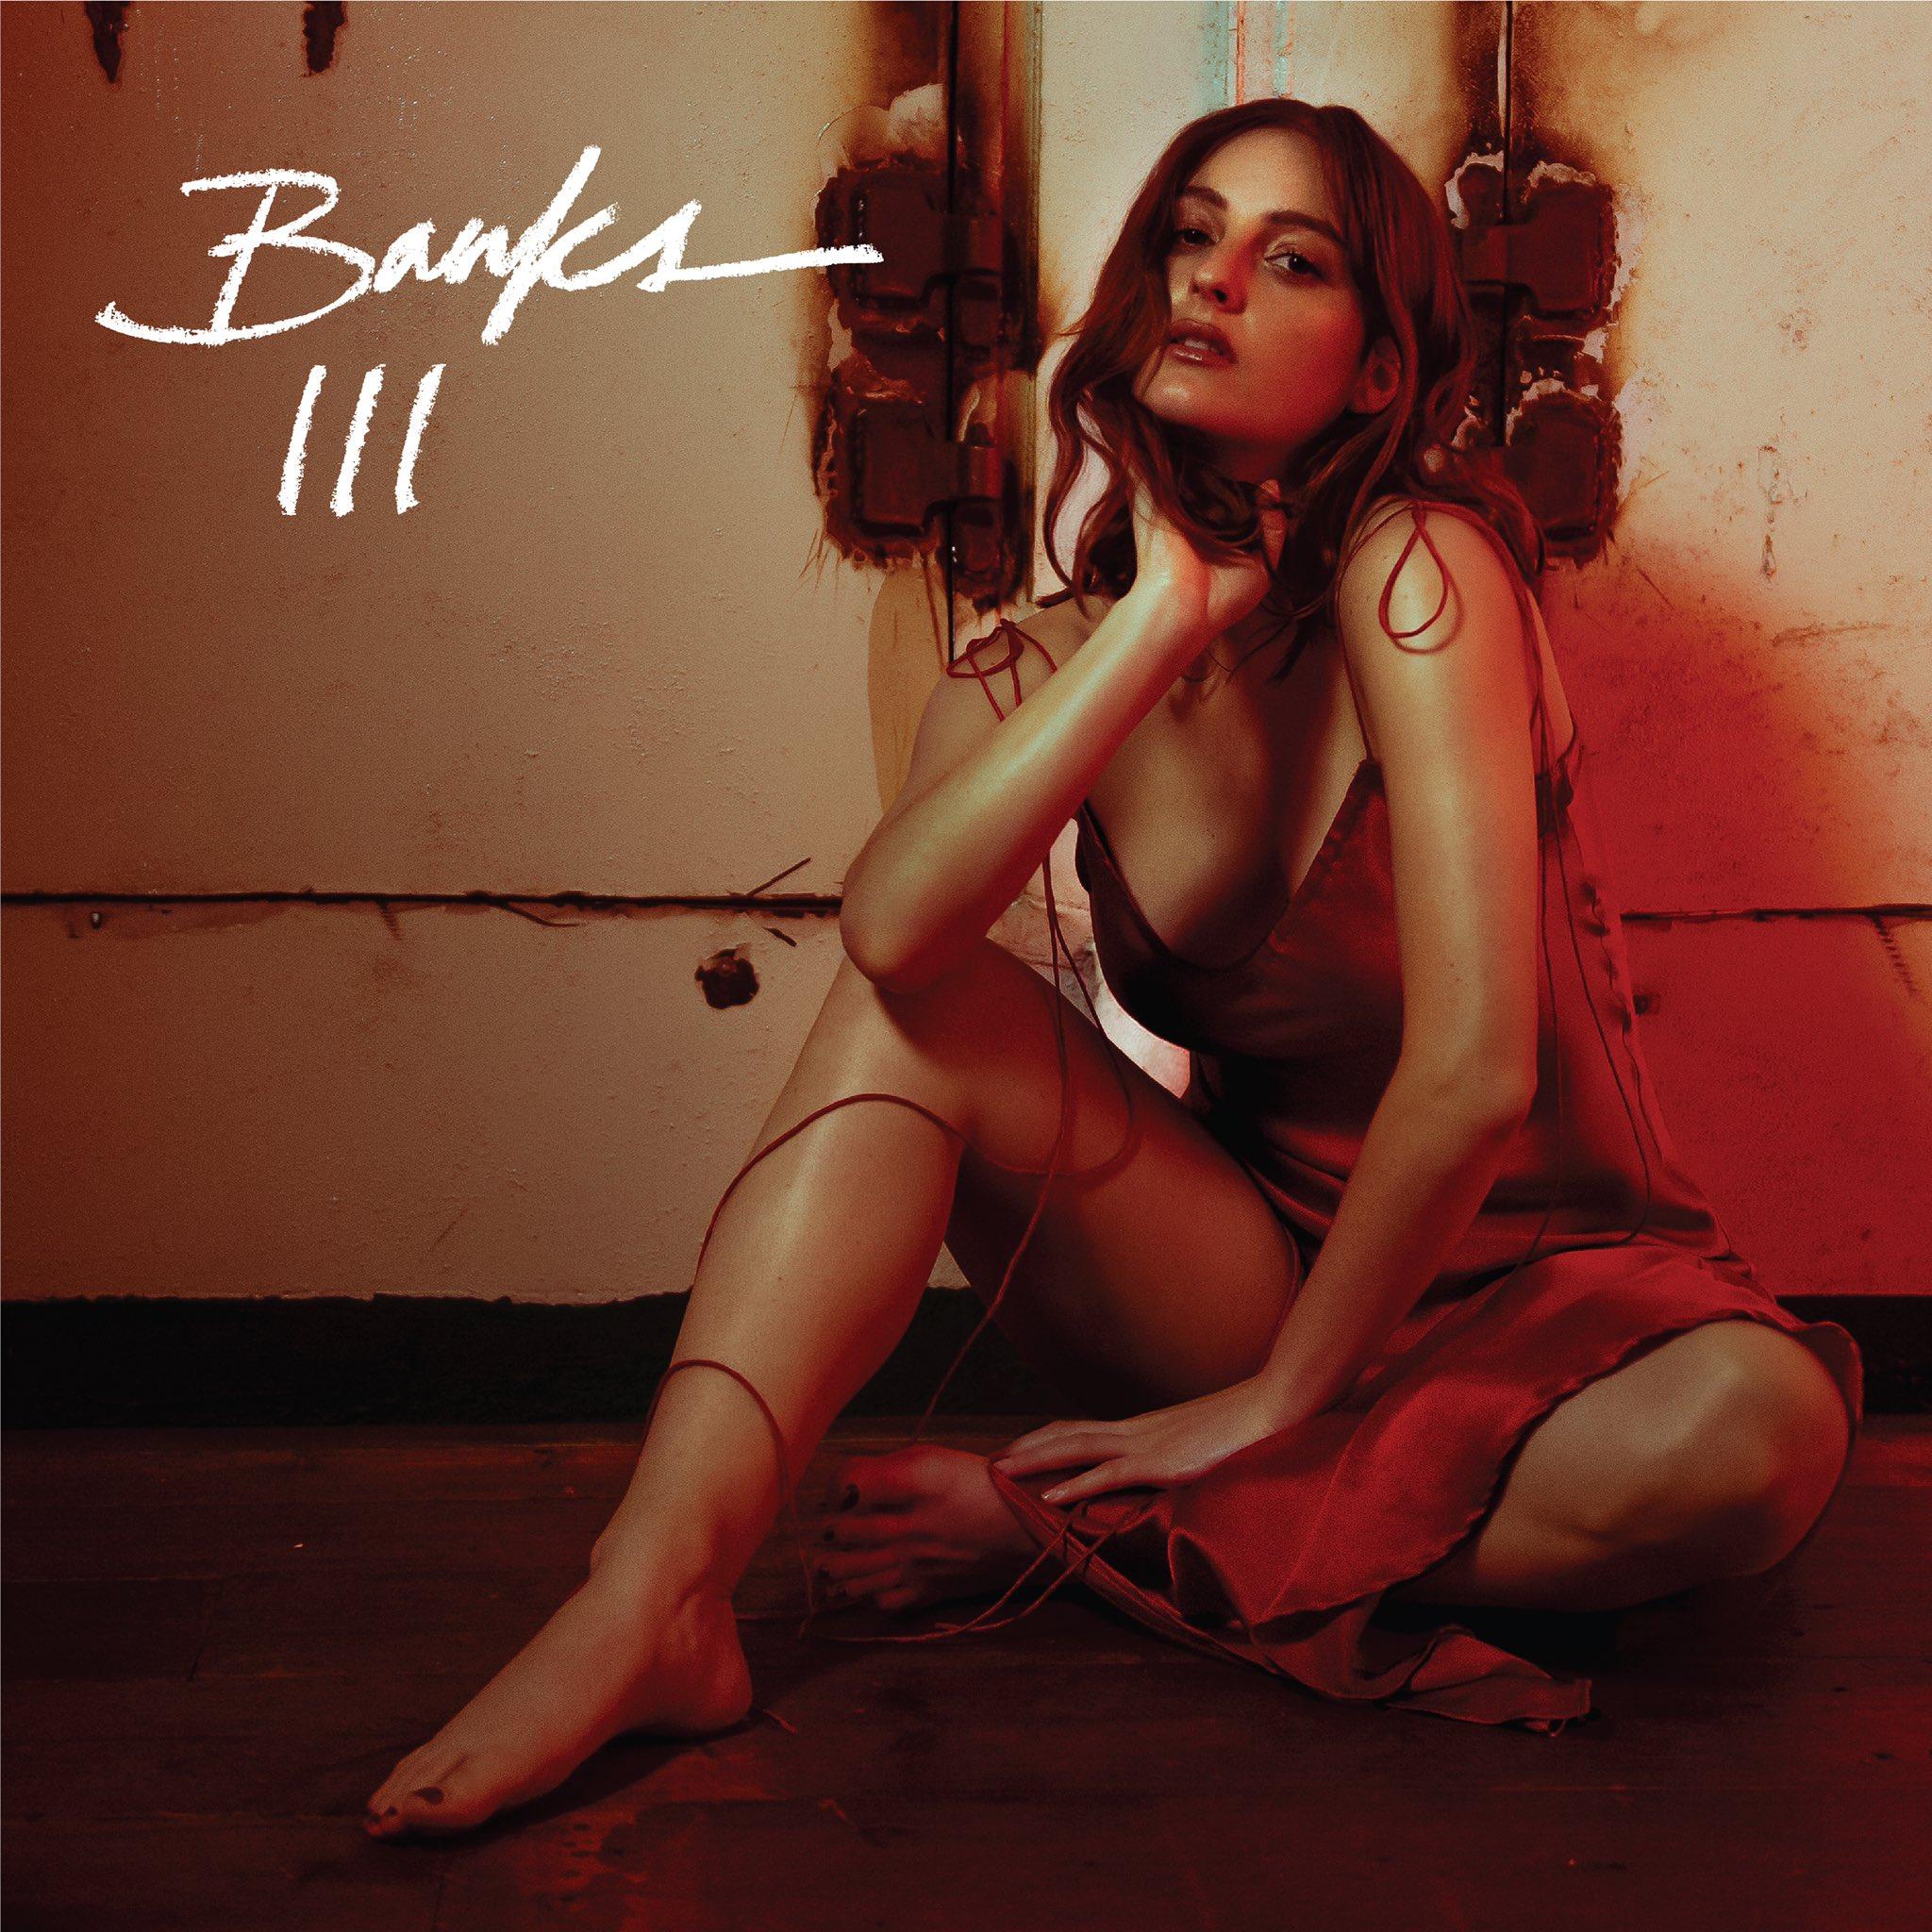 banks 3 album review